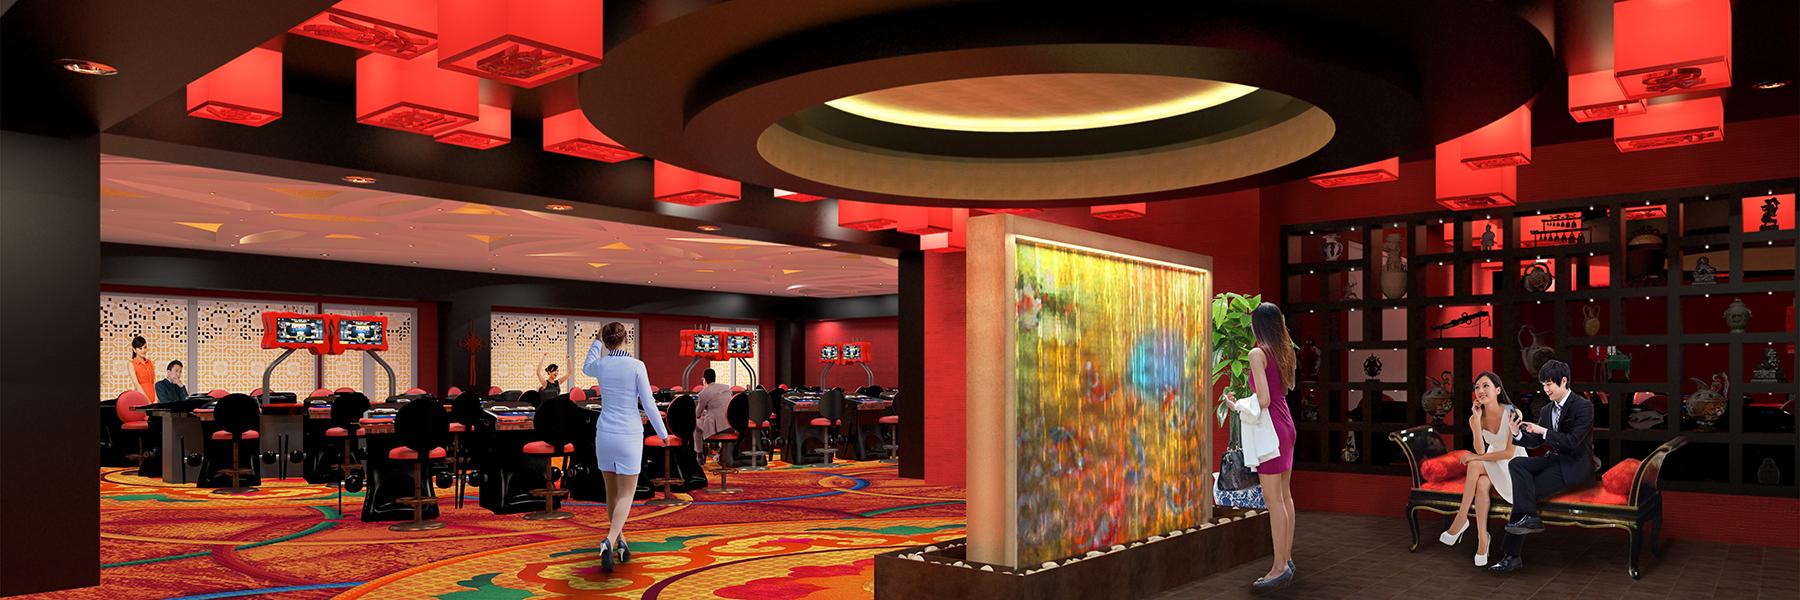 Resort's World Casino - Baccarat Club